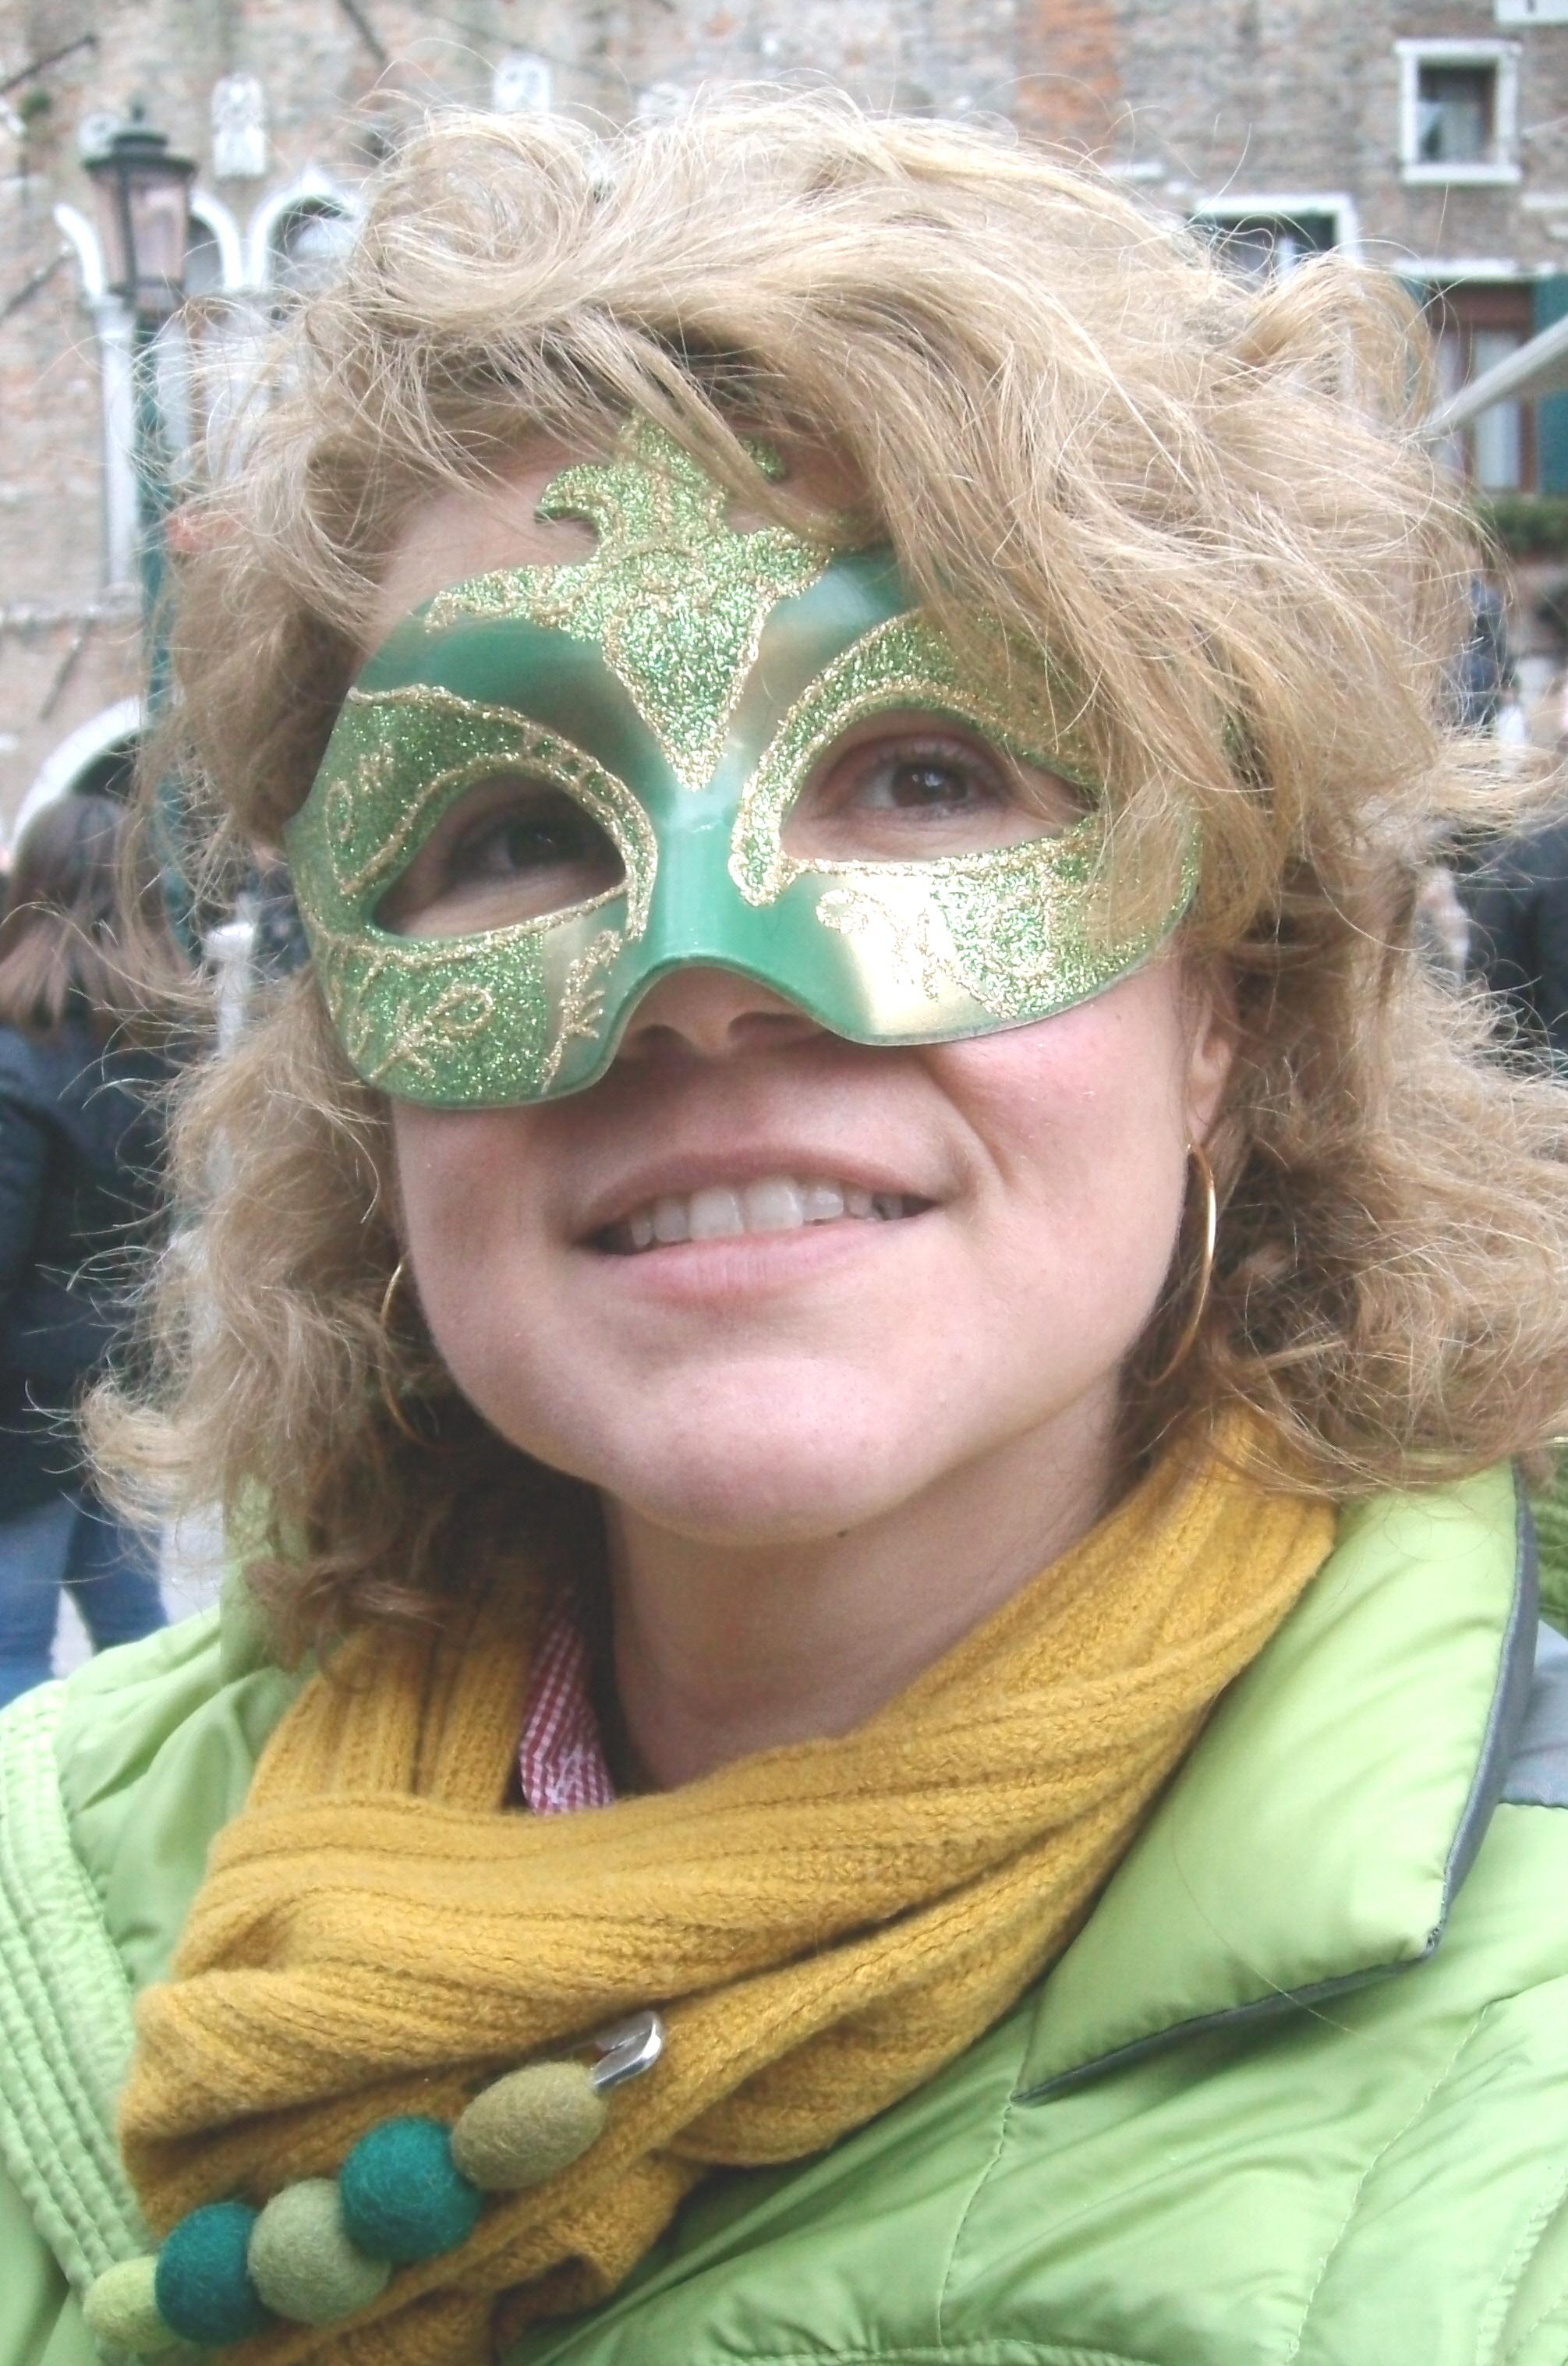 Silva al Carnevale di Venezia - Foto Guido Comin